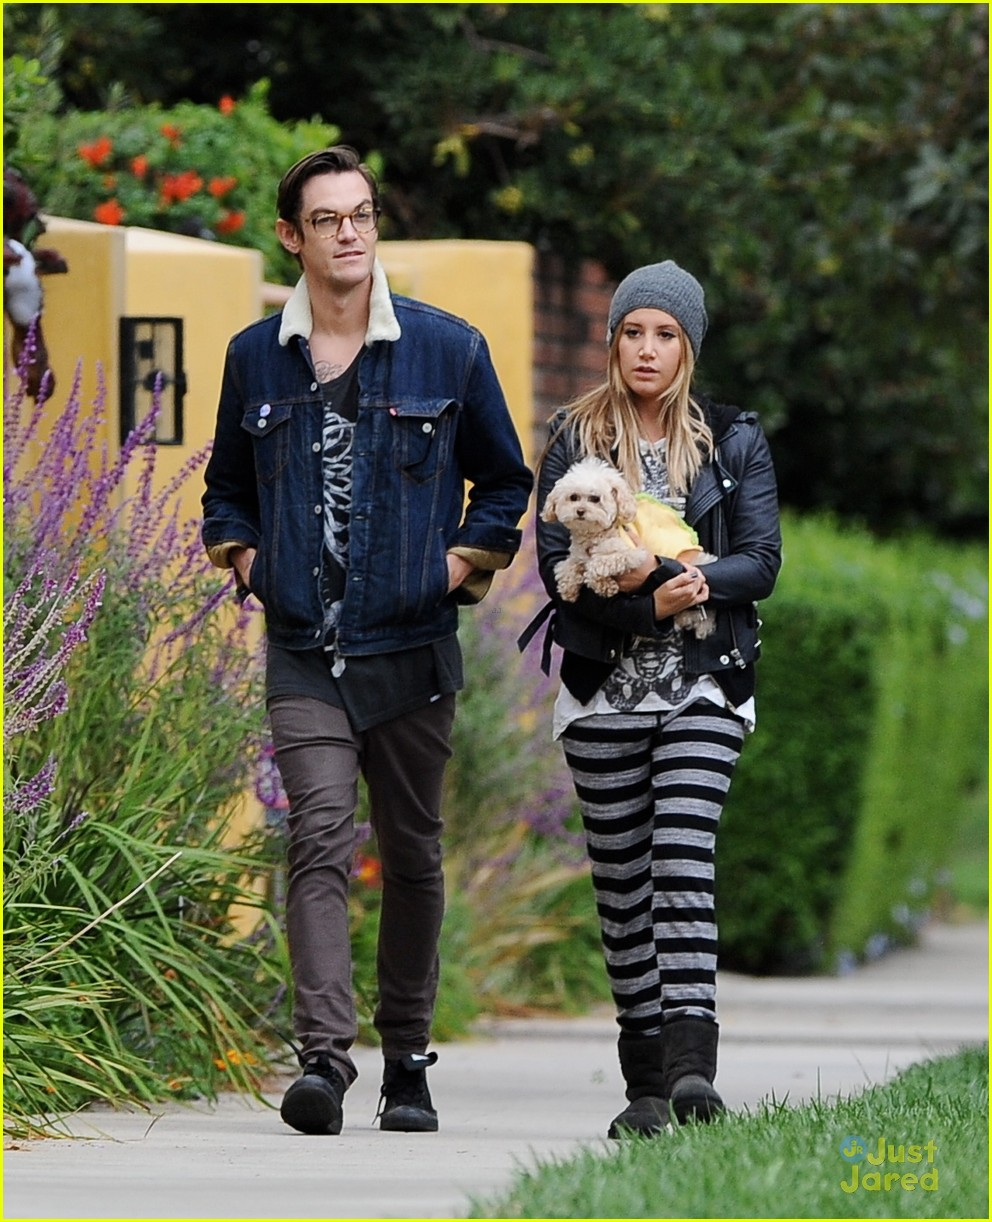 ashley tisdale chris french maui walk halloween 01 - Ashley Tisdale Halloween